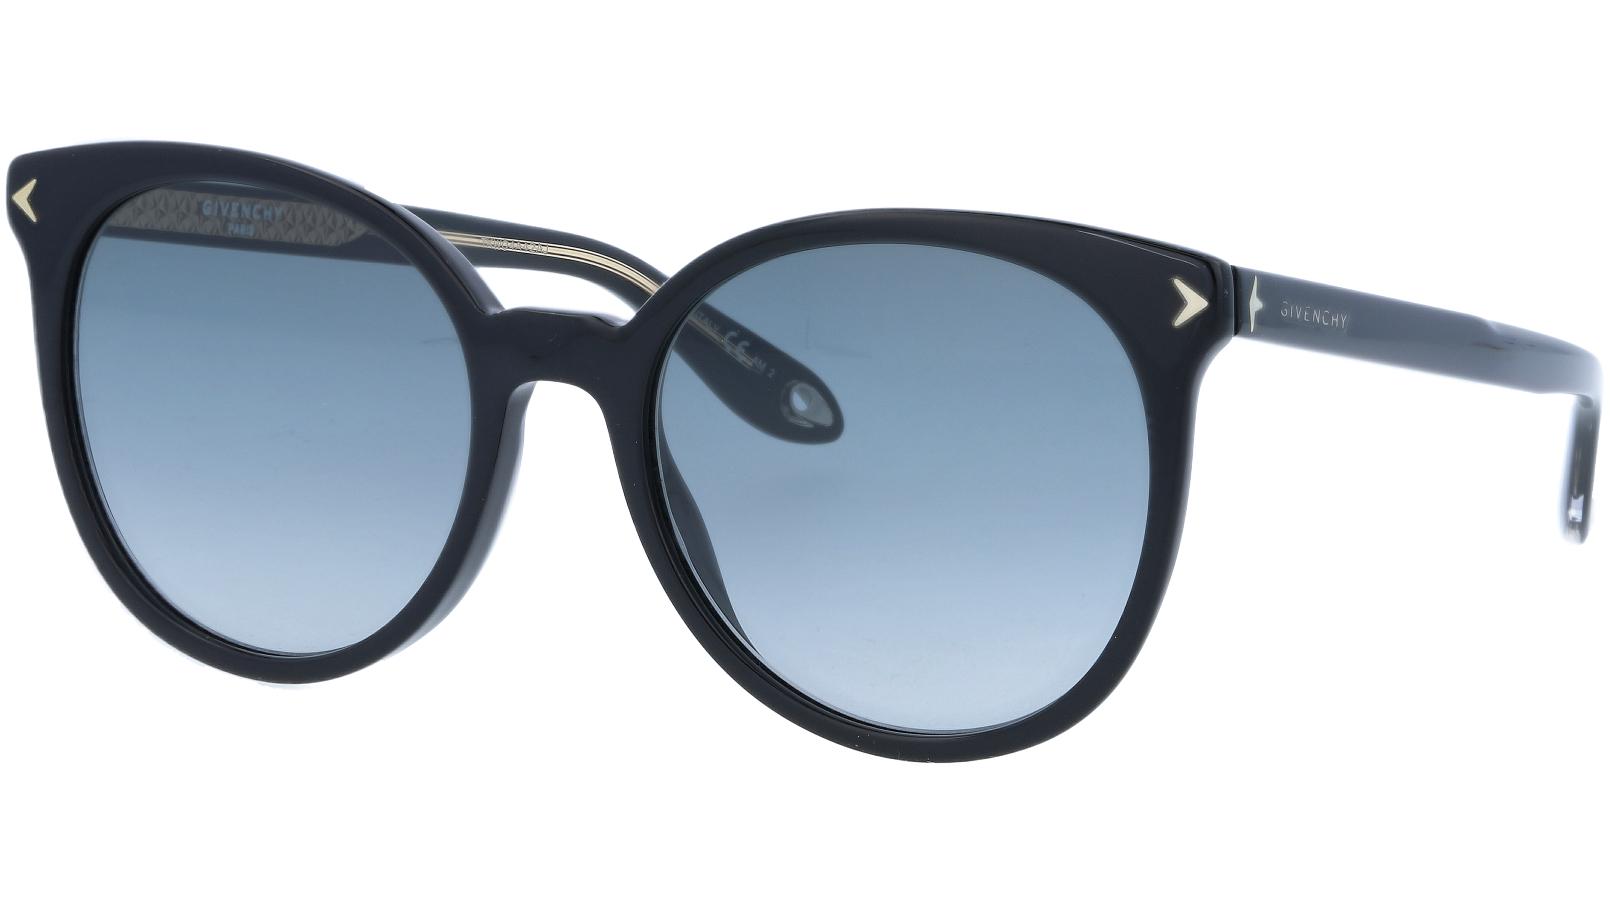 Givenchy GV7077S 80790 54 Black Sunglasses